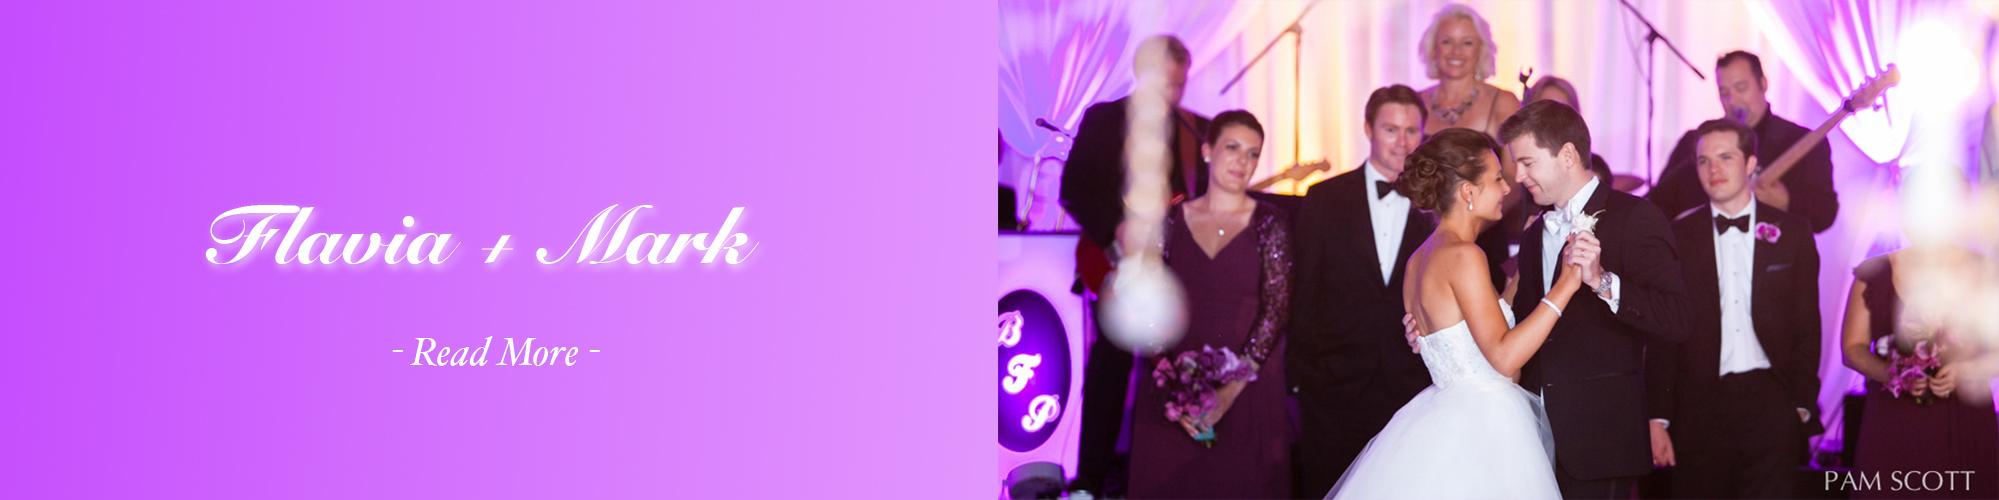 Wedding Music Flavia & Mark.jpg